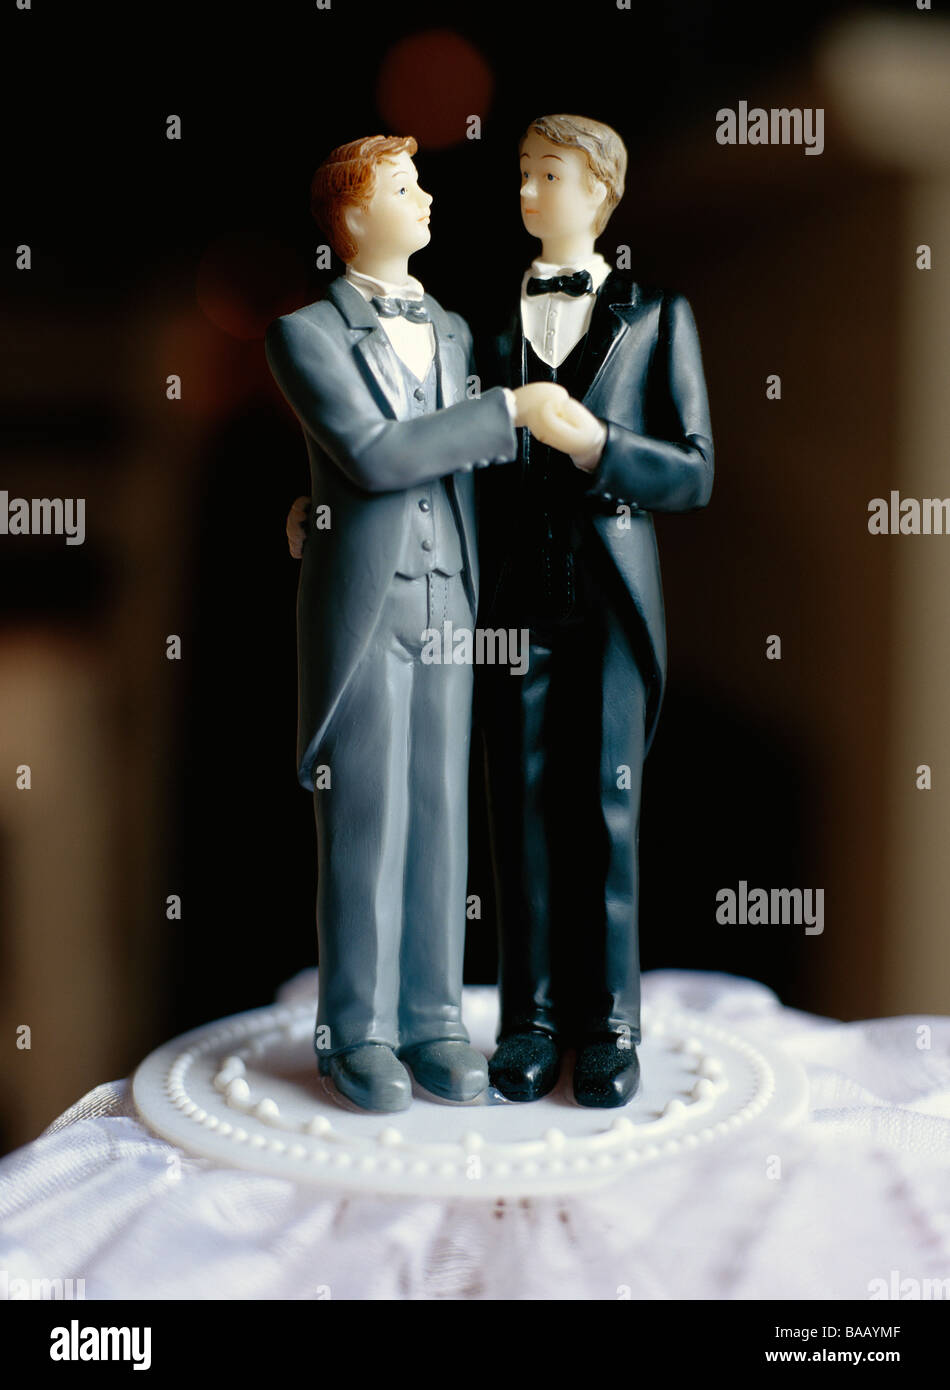 Un gay couples nuptiales sur un gâteau, la Suède. Photo Stock